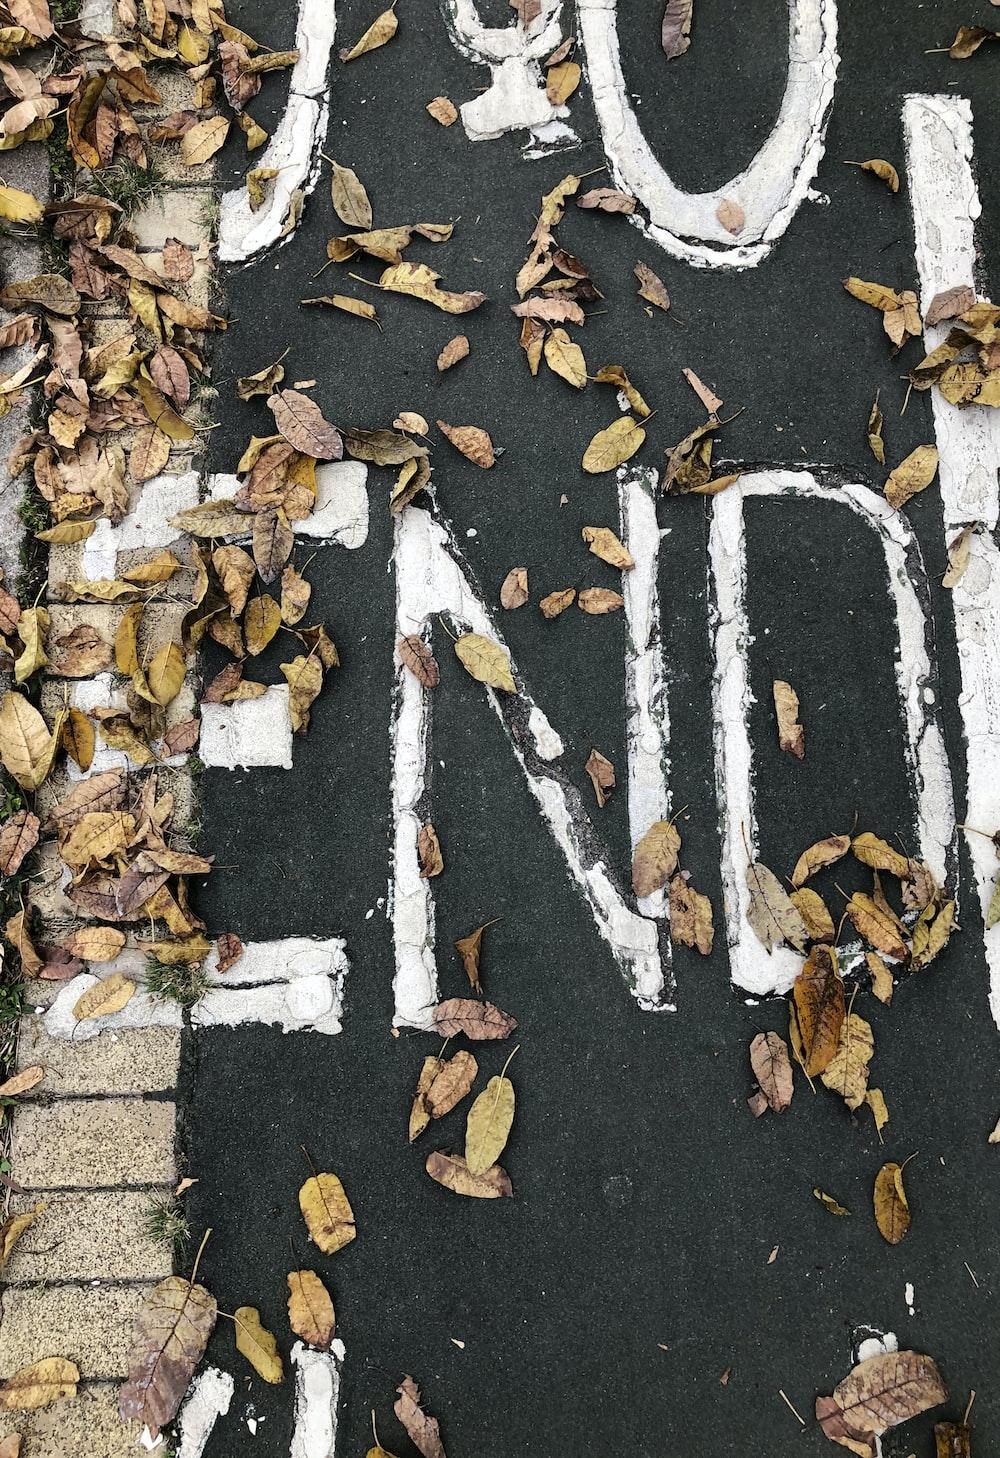 dry leaves on black concrete pavement